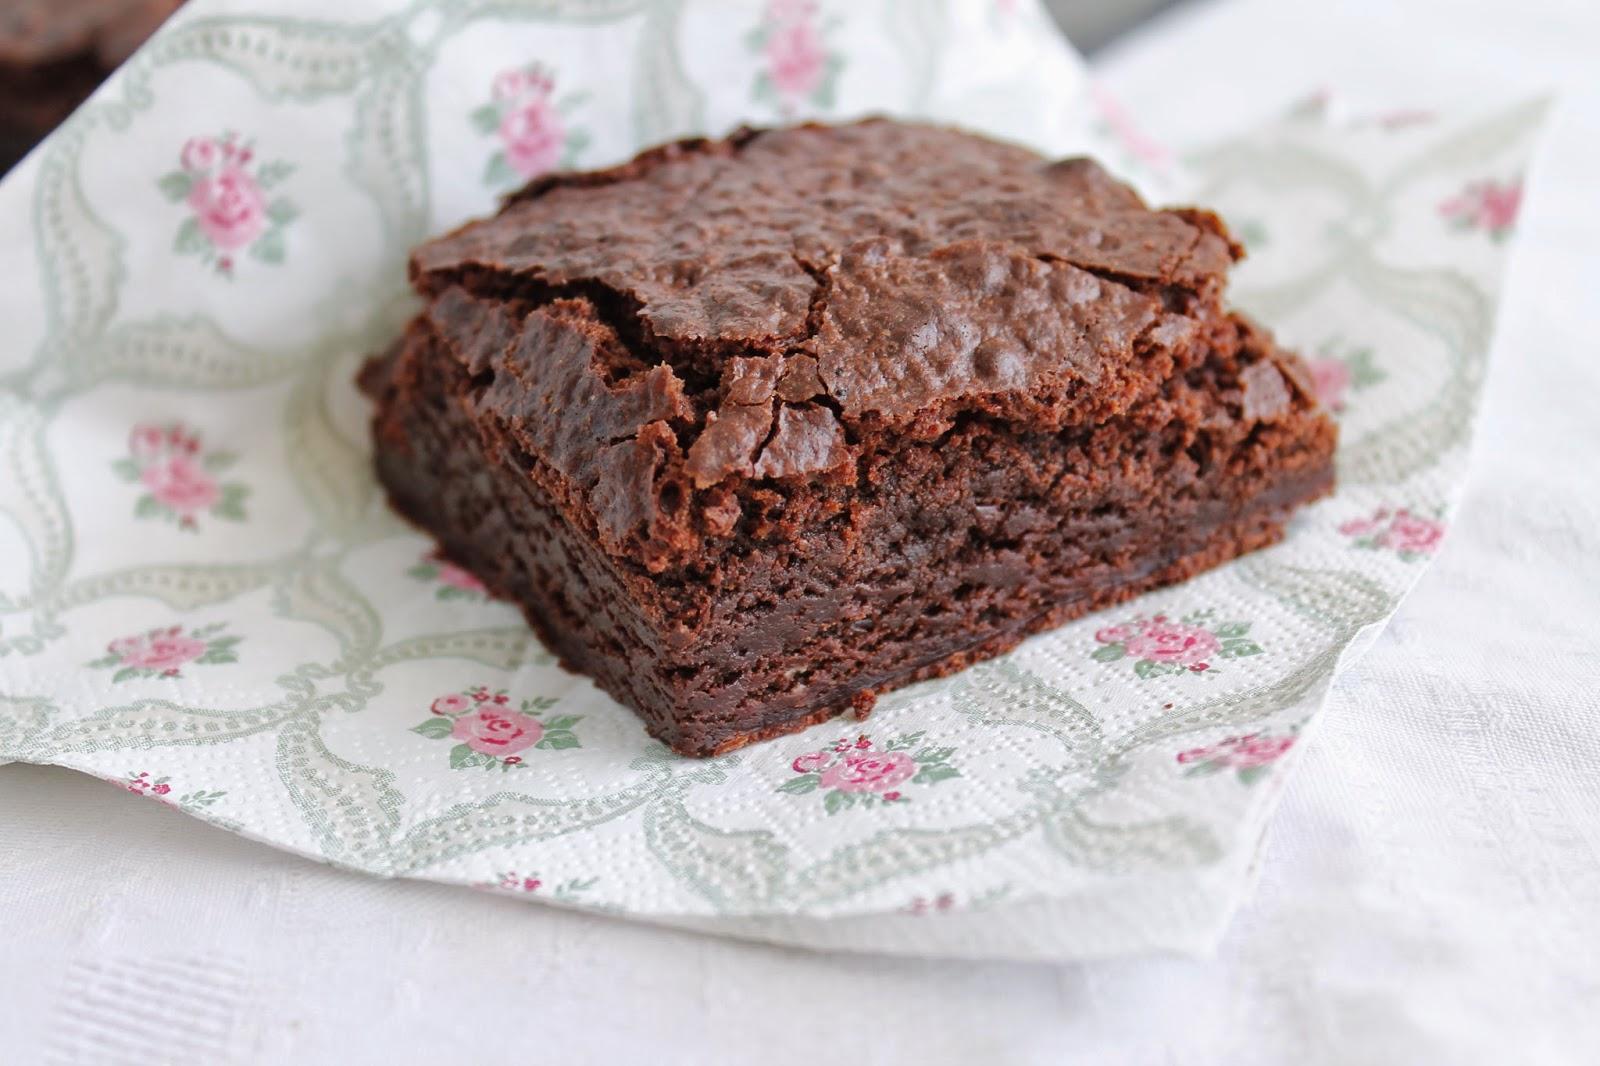 Receta de Brownie con sabor a café